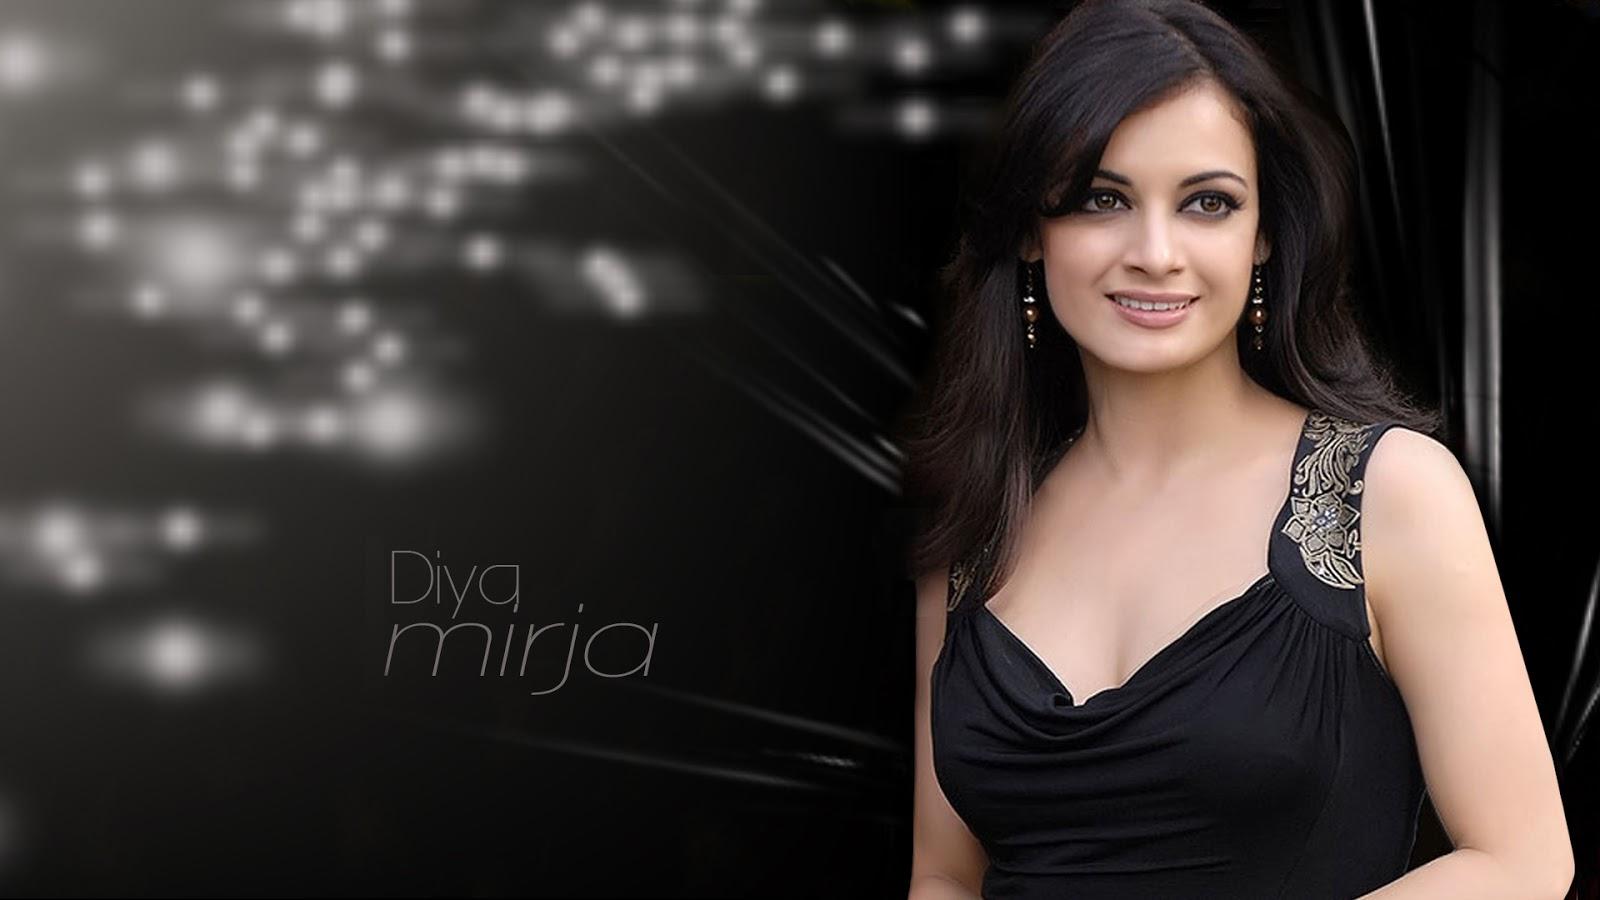 HD Wallpapers Fine diya mirza hot hd wallpapers 1080p download 1600x900